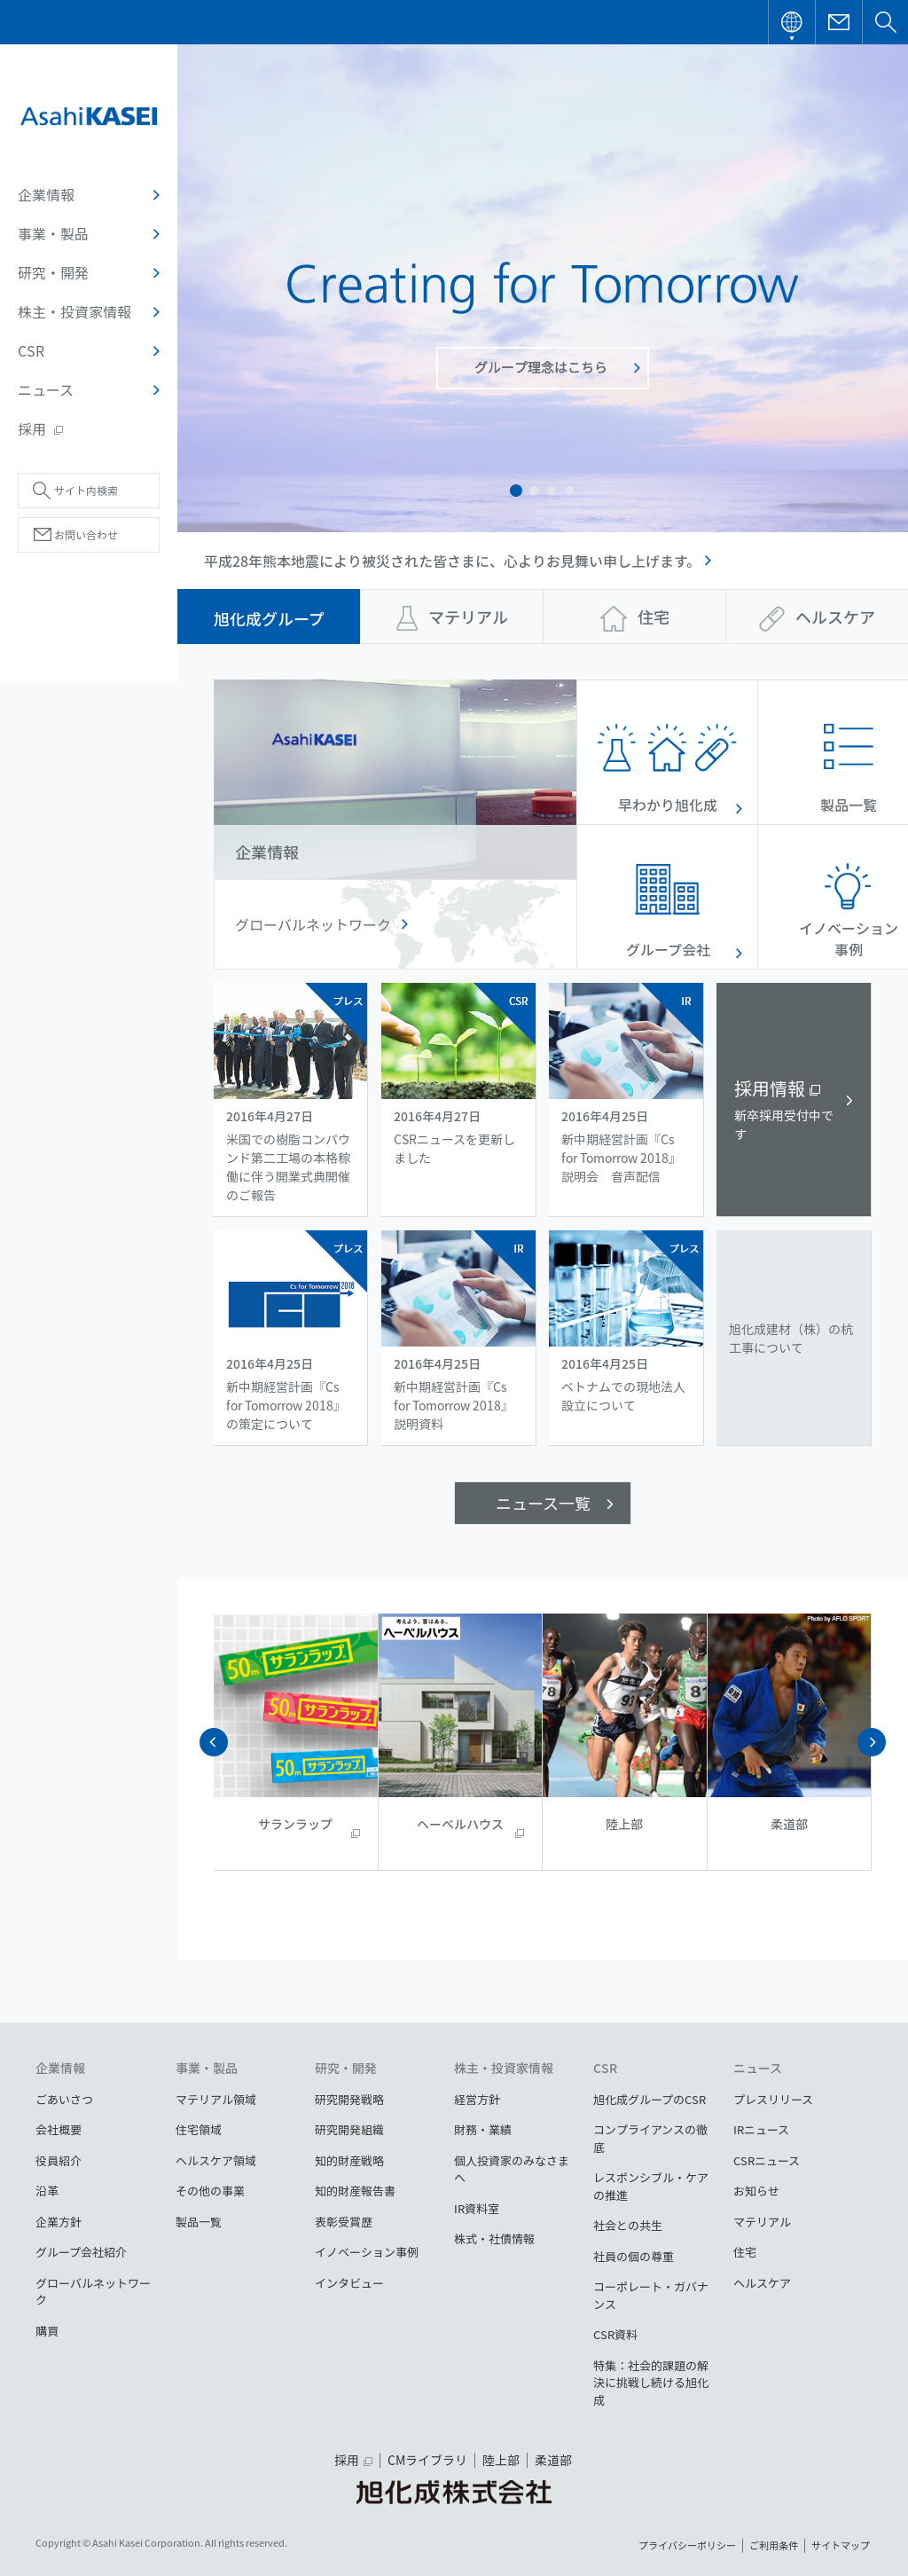 Asahi Kasei Competitors, Revenue and Employees - Owler